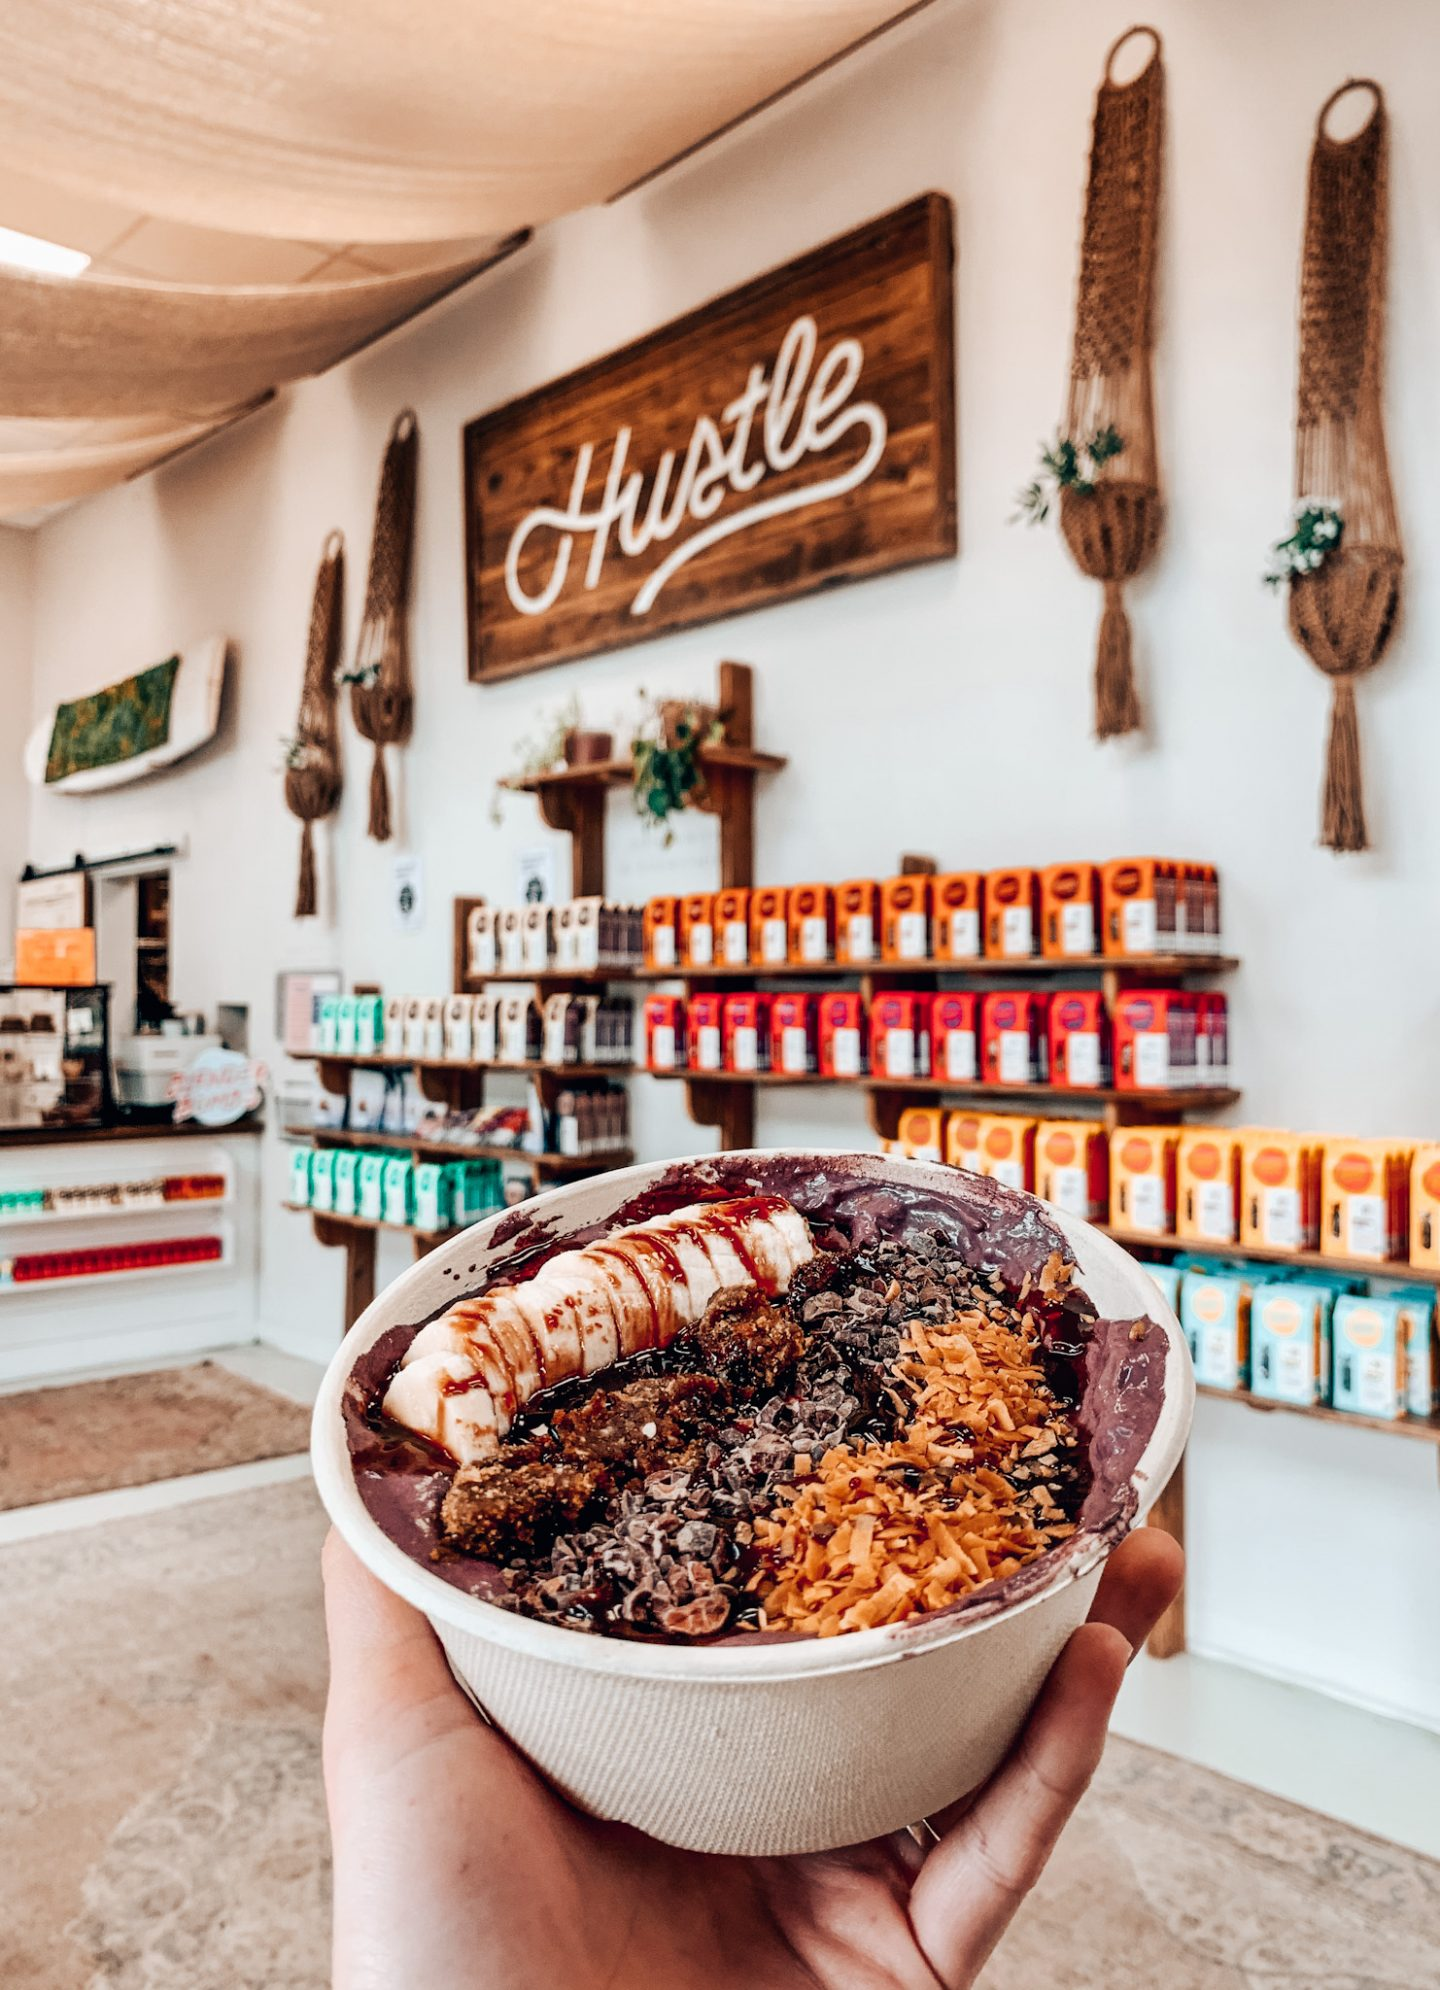 Hustle Smoothie Bar in Charleston, SC